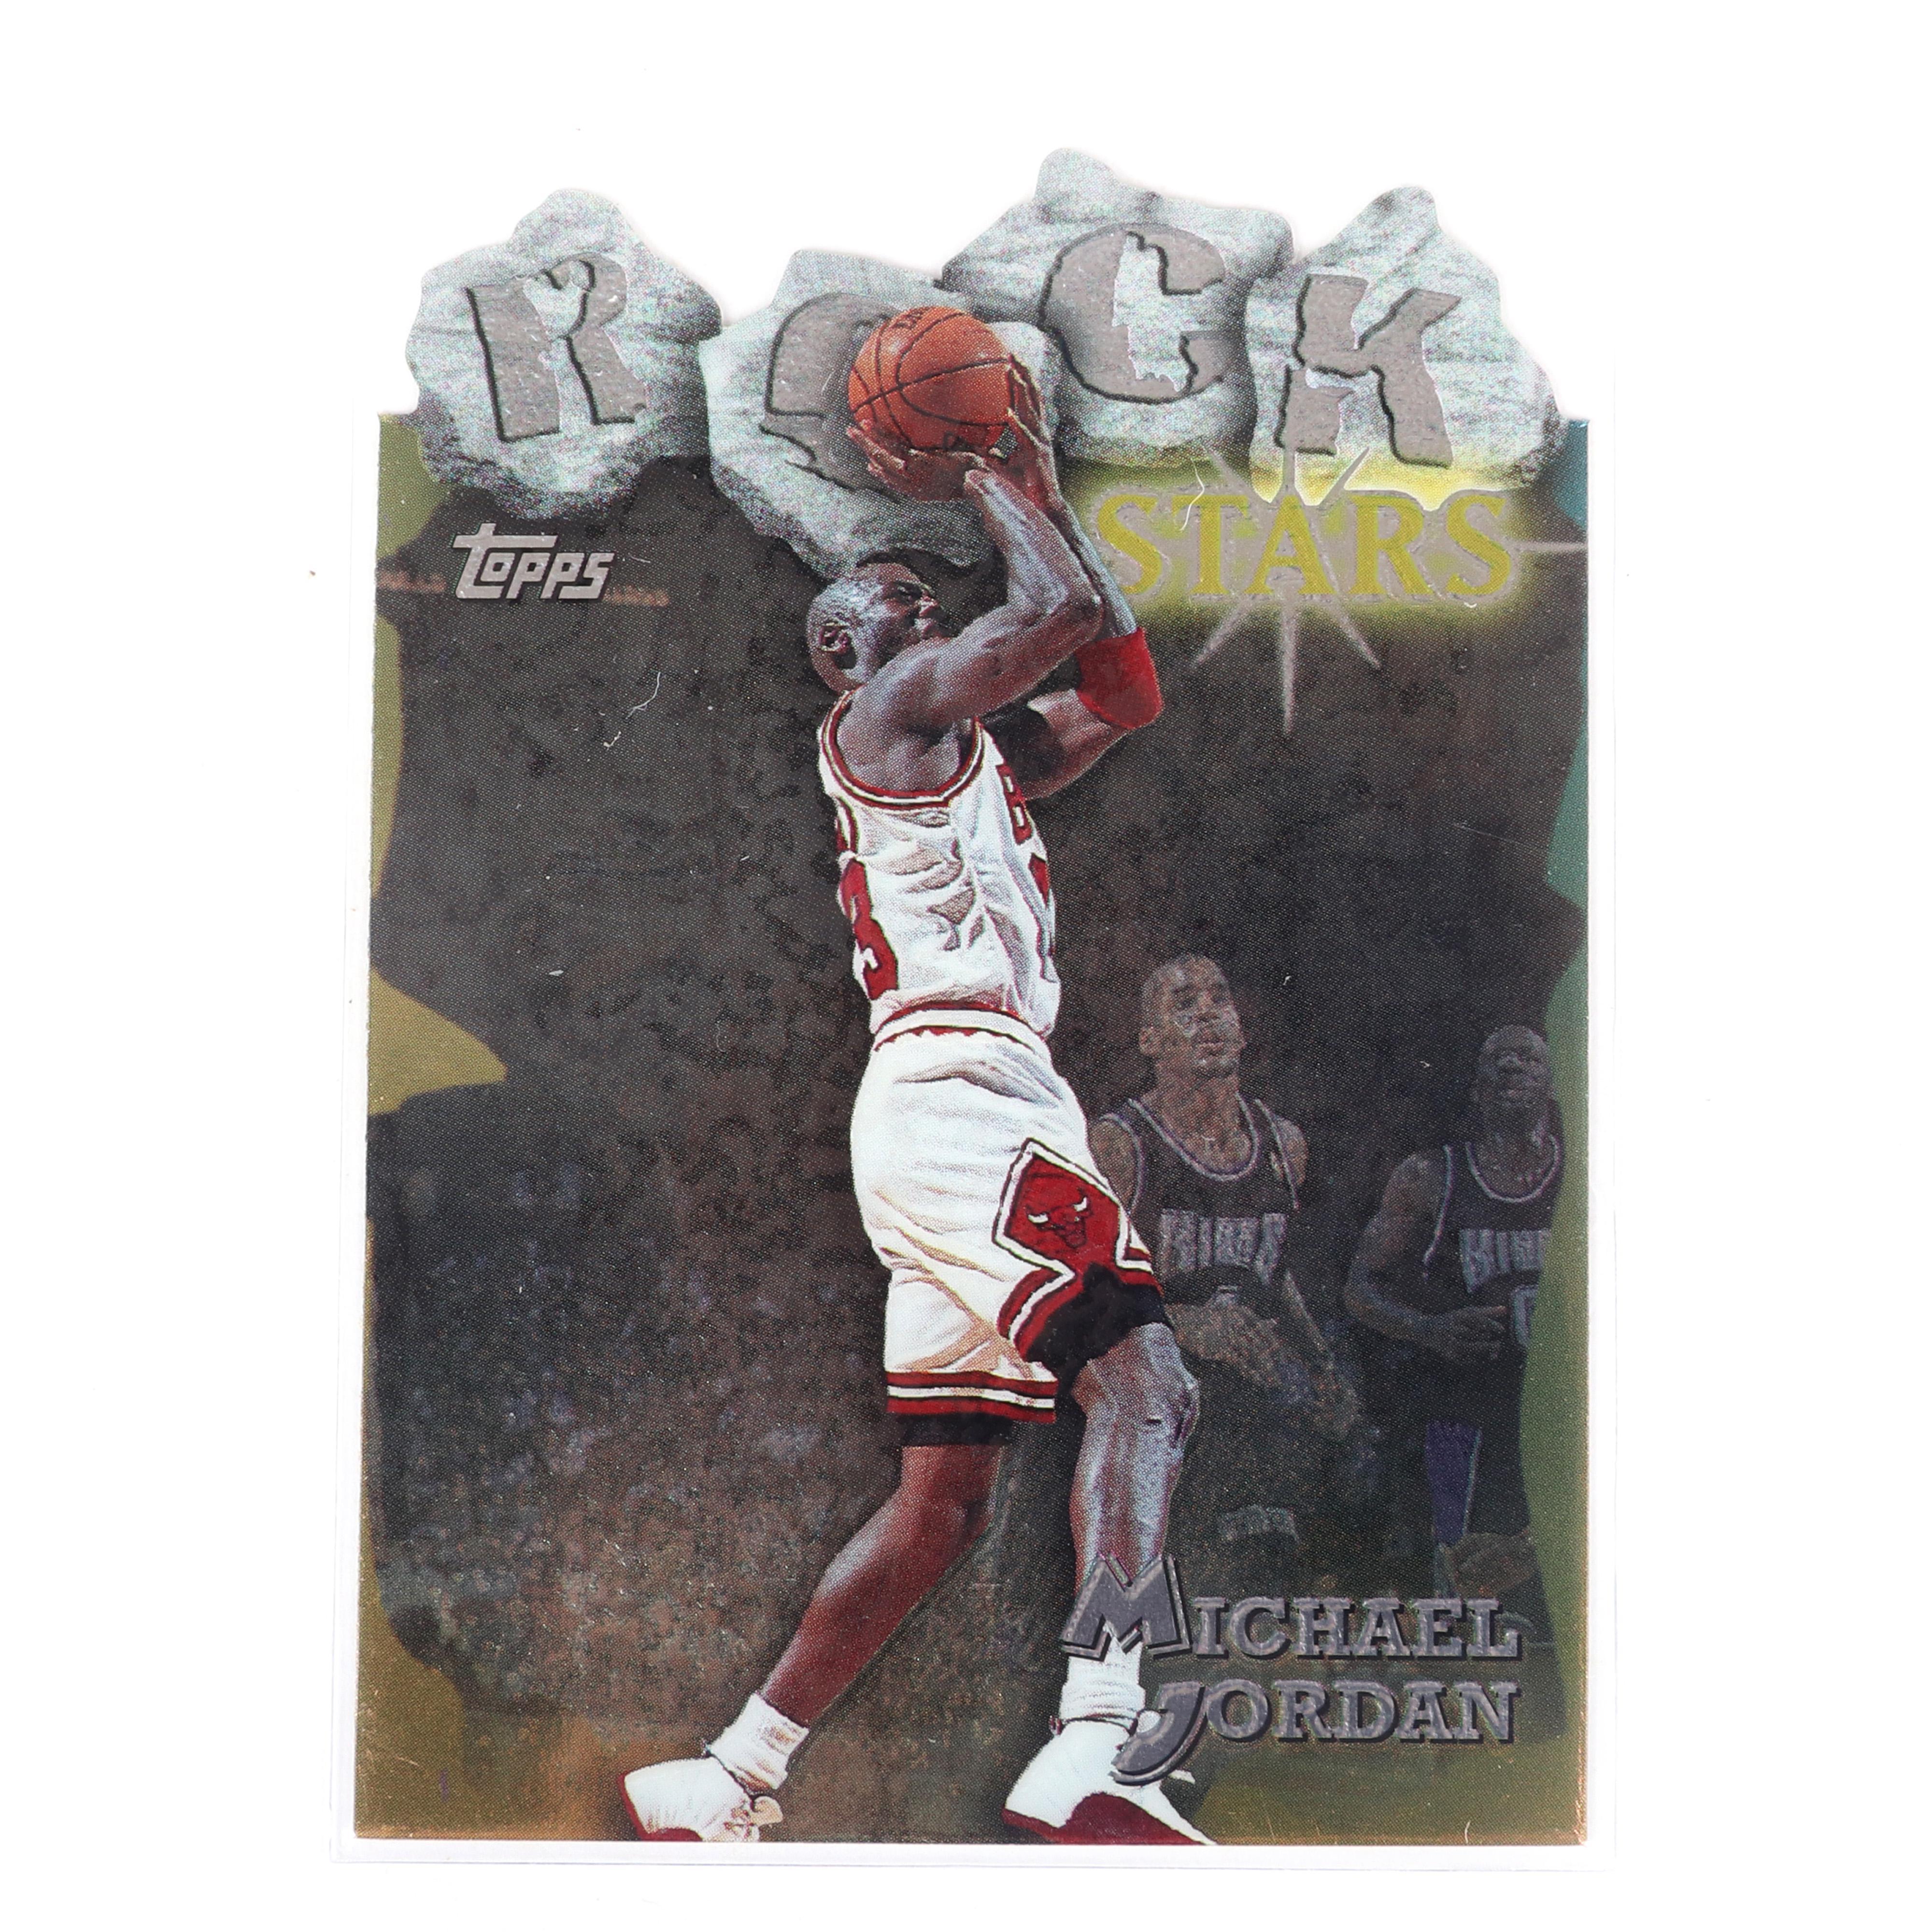 1997-98 Topps Michael Jordan Rock Stars Die Cut Insert #RS1